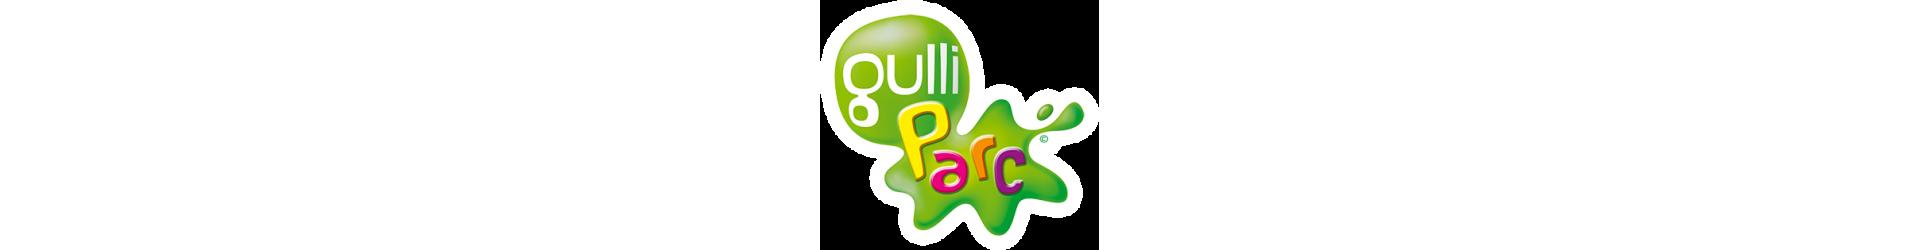 Gulli Parc